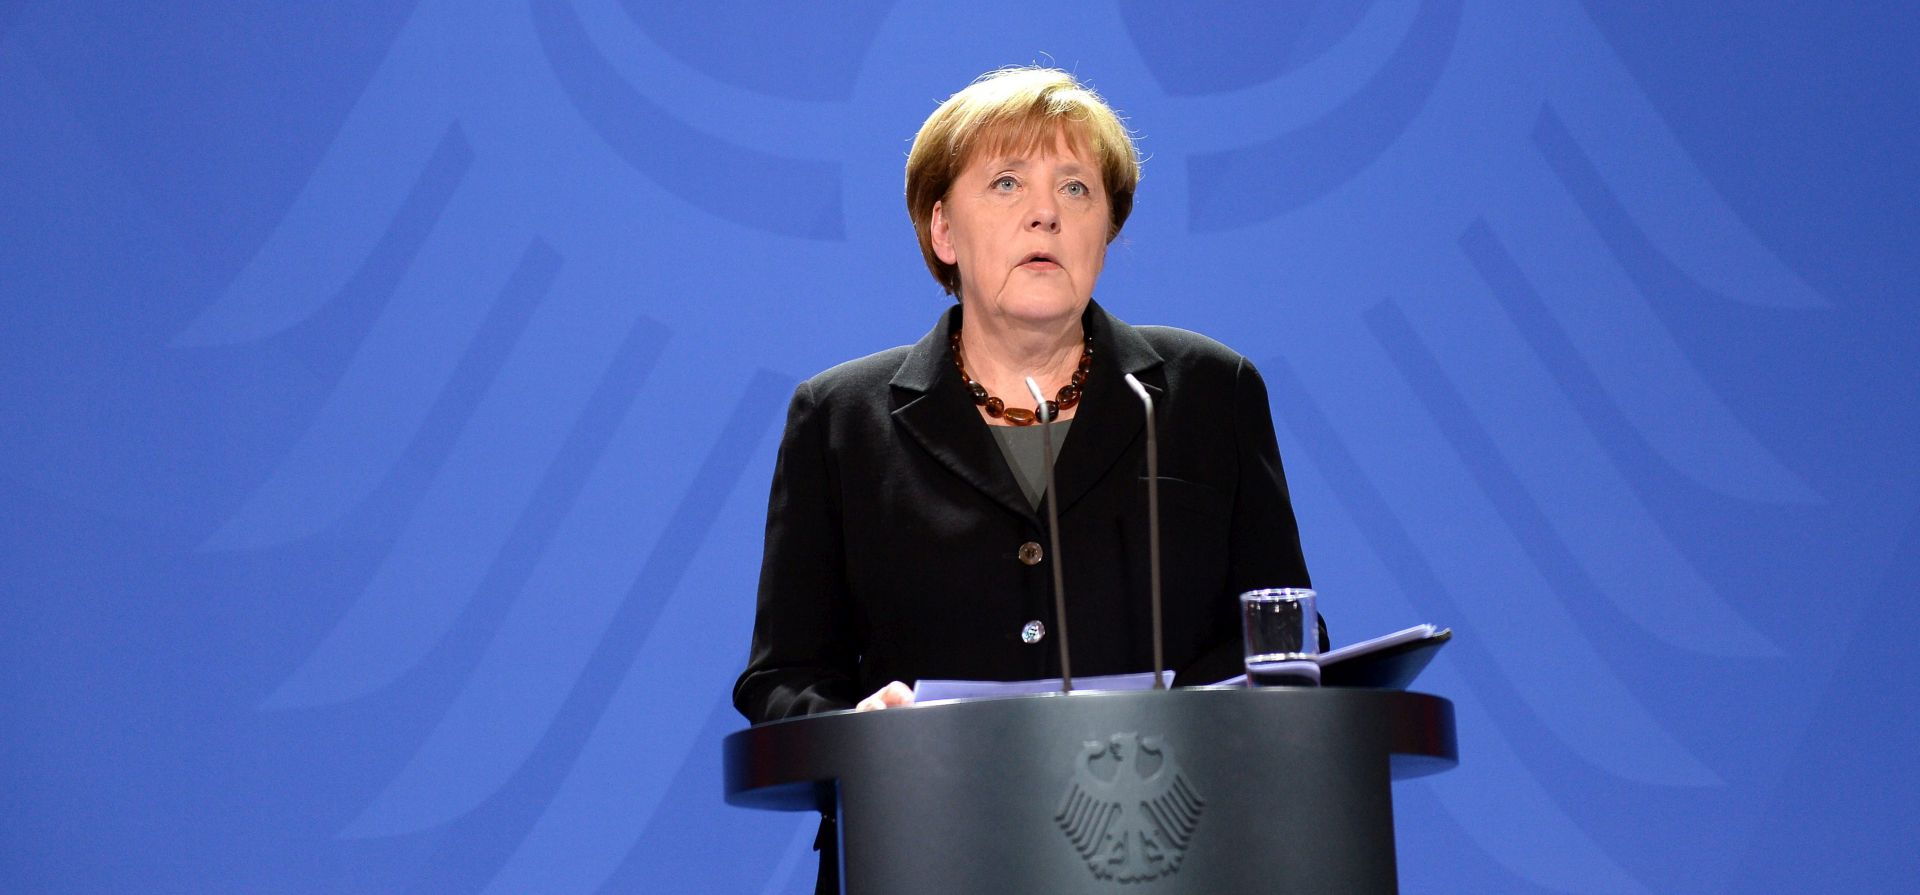 BREXIT: Merkel se nada da će se Britanci izjasniti za ostanak u EU